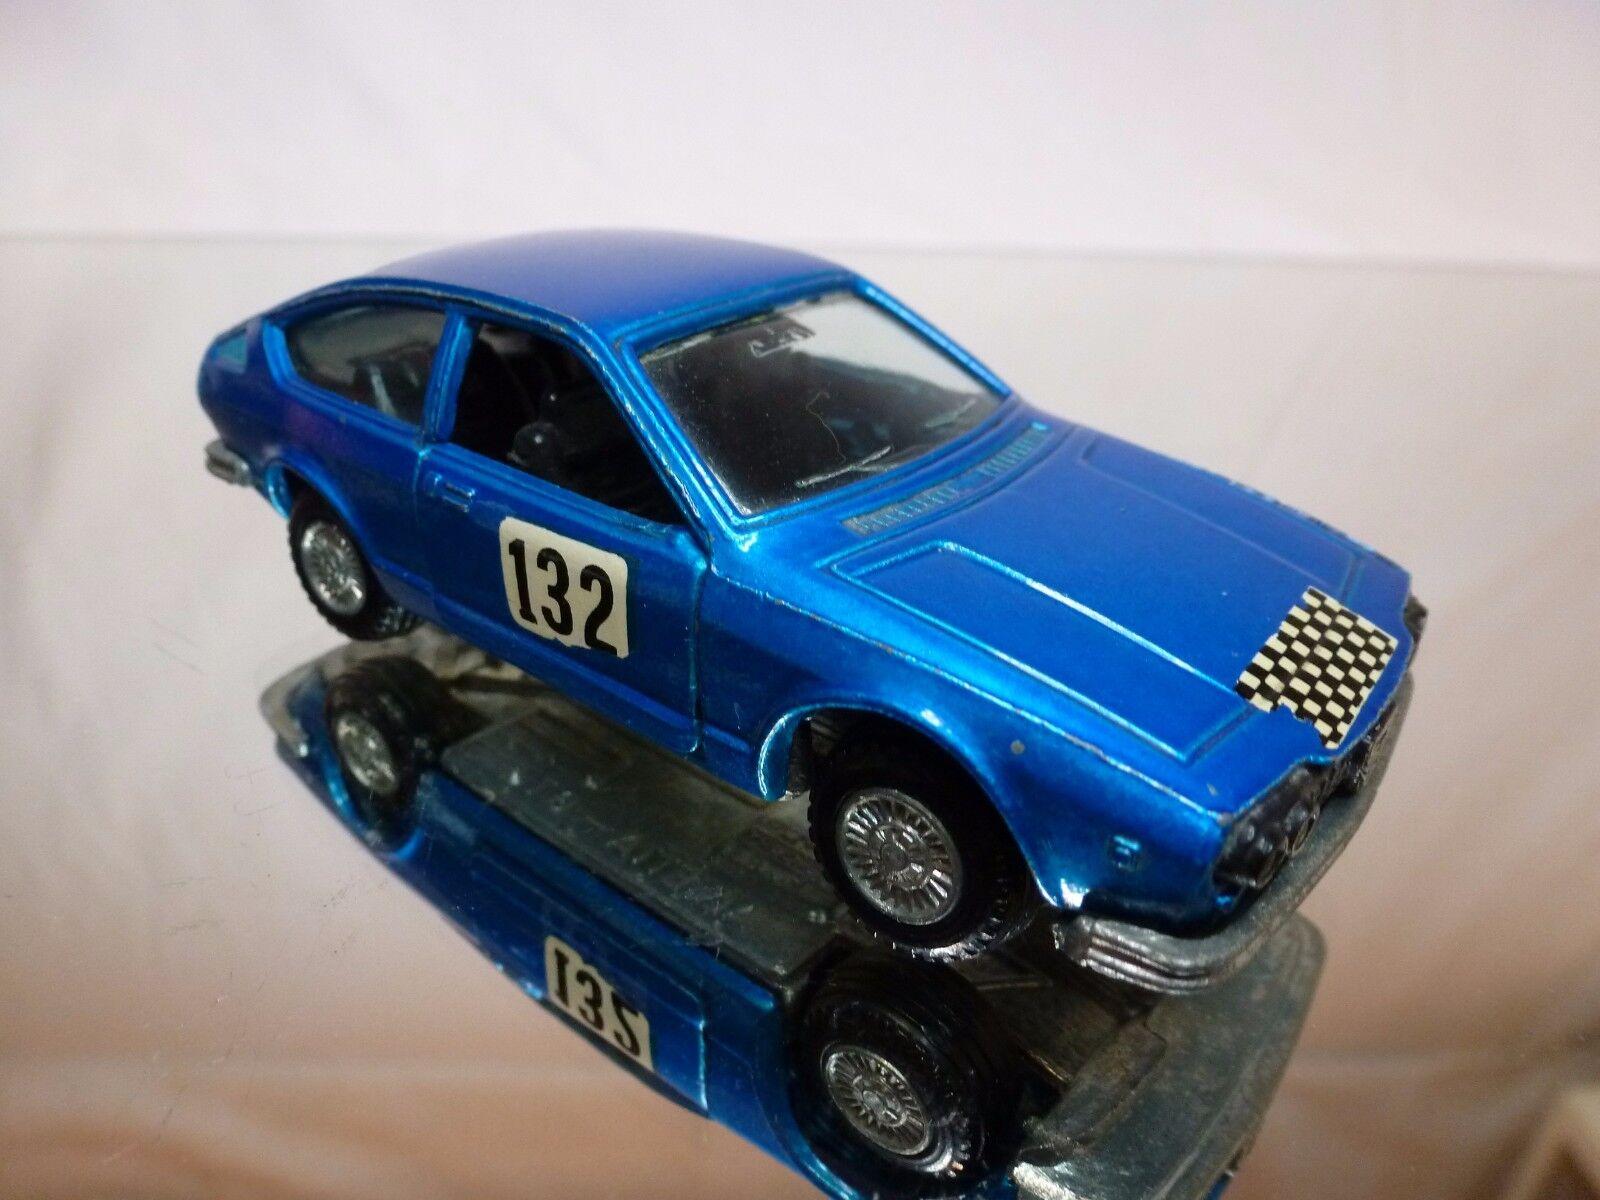 MERCURY 306 ALFA ROMEO ROMEO ROMEO ALFETTA GT RALLY  132 - azul METALLIC 1 43 - GOOD COND. a67814